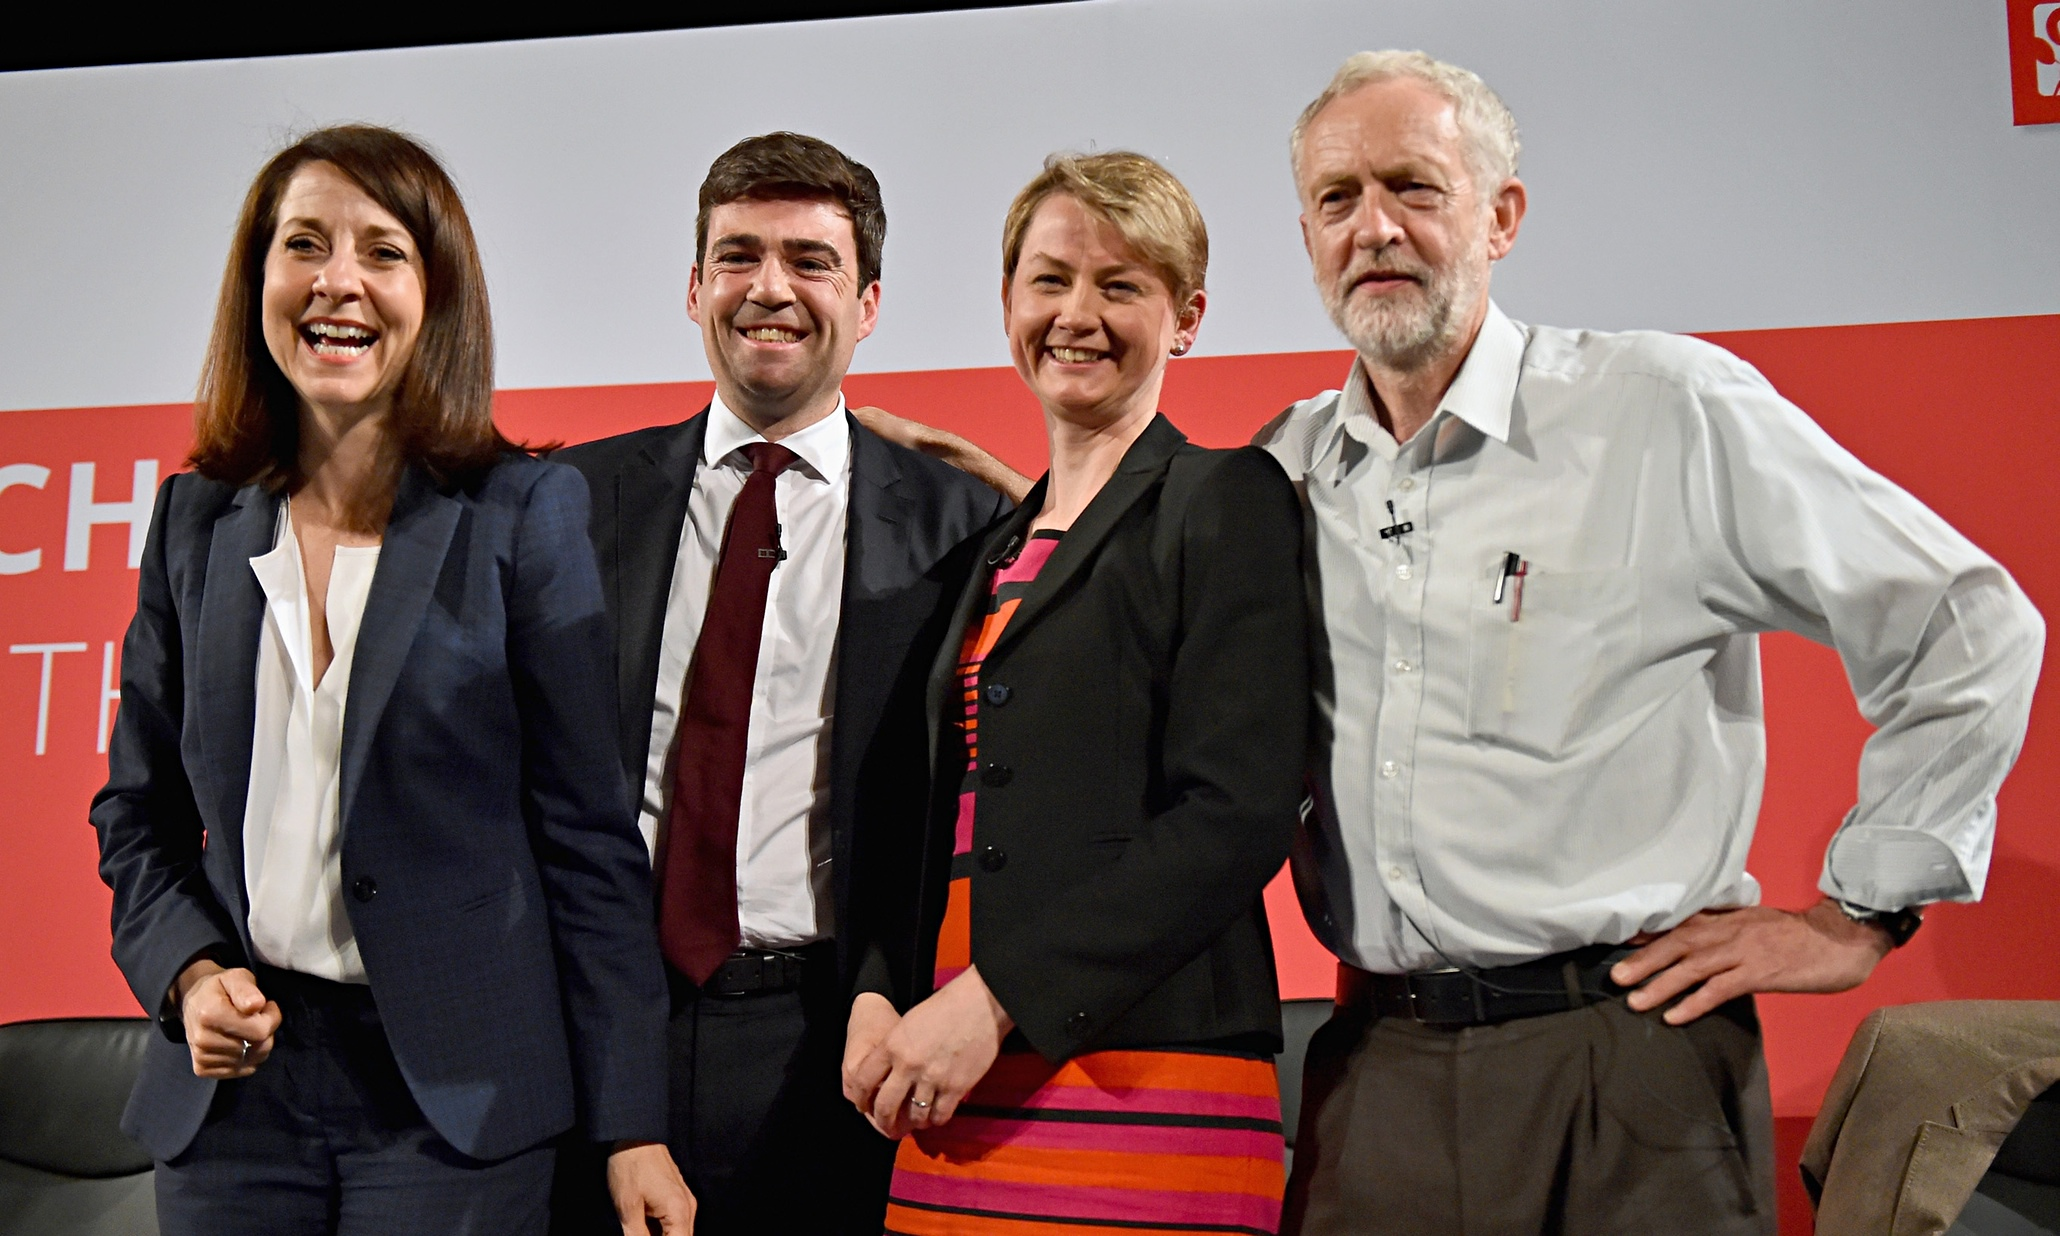 UK-Labour-Party-Leadershi-009.jpg